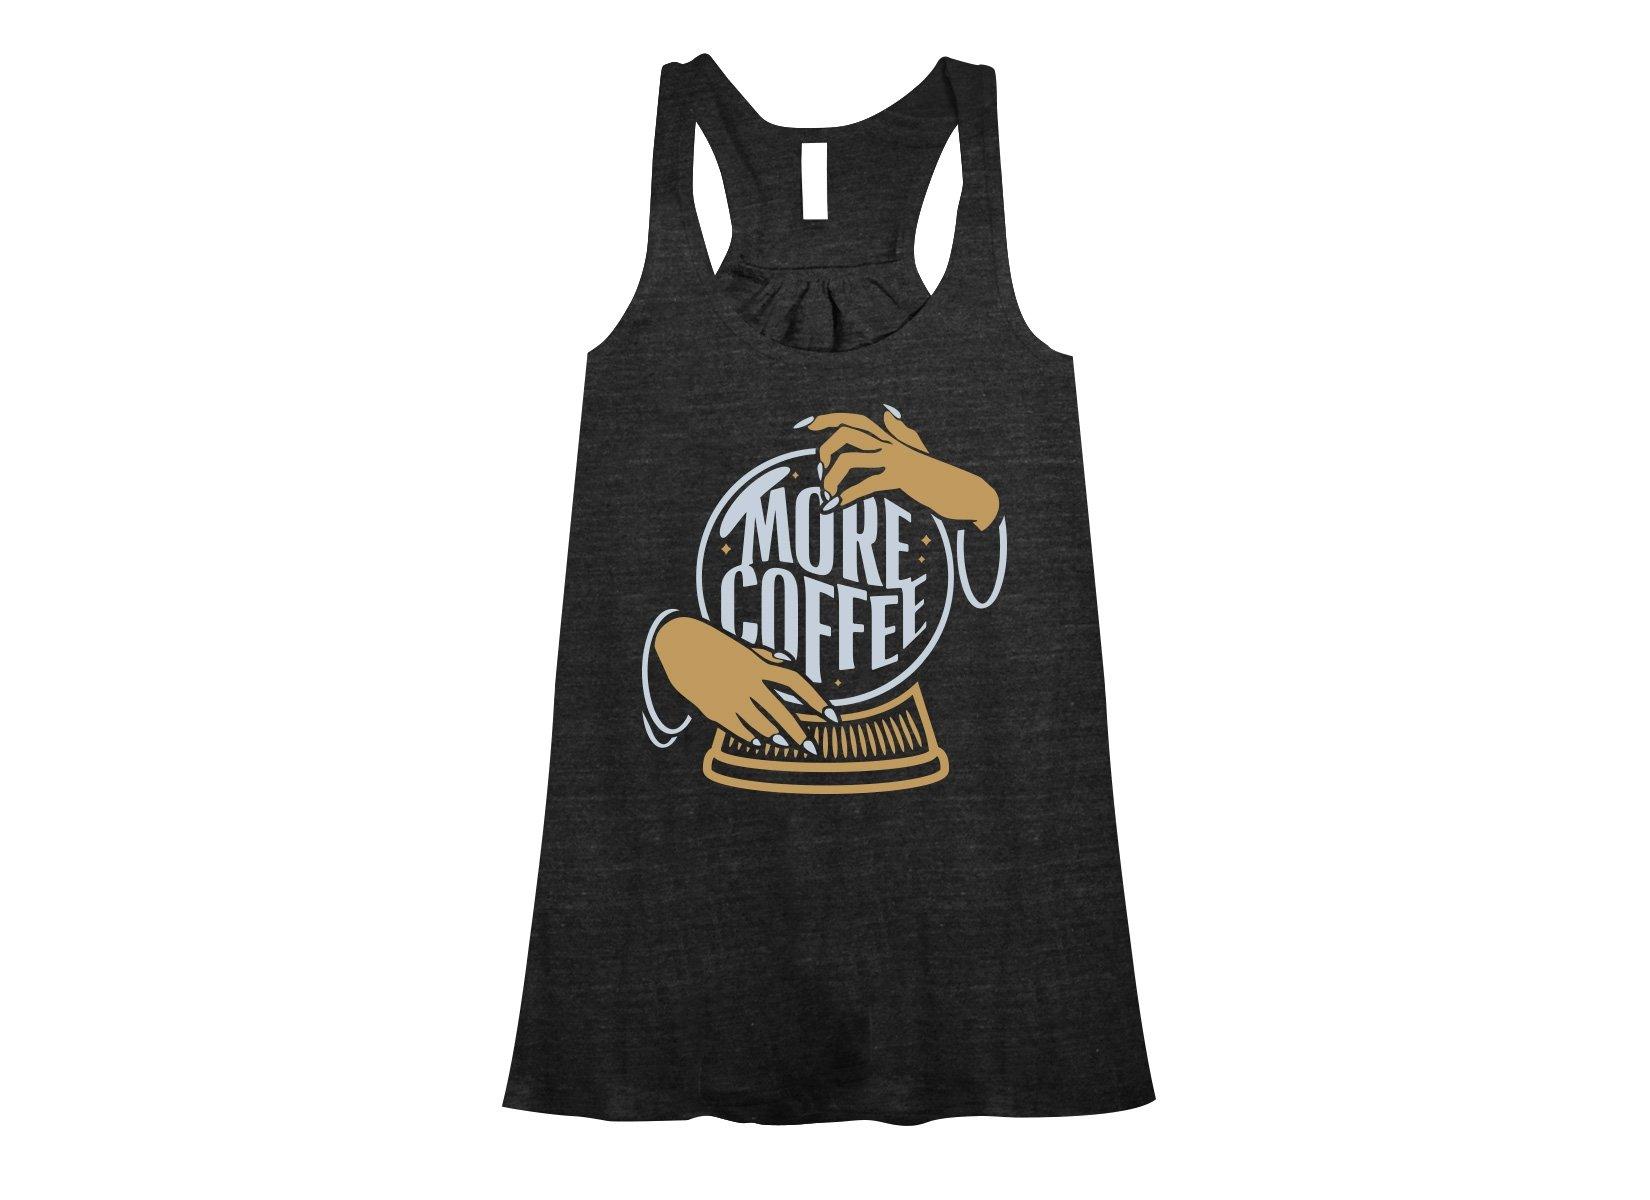 More Coffee on Womens Tanks T-Shirt